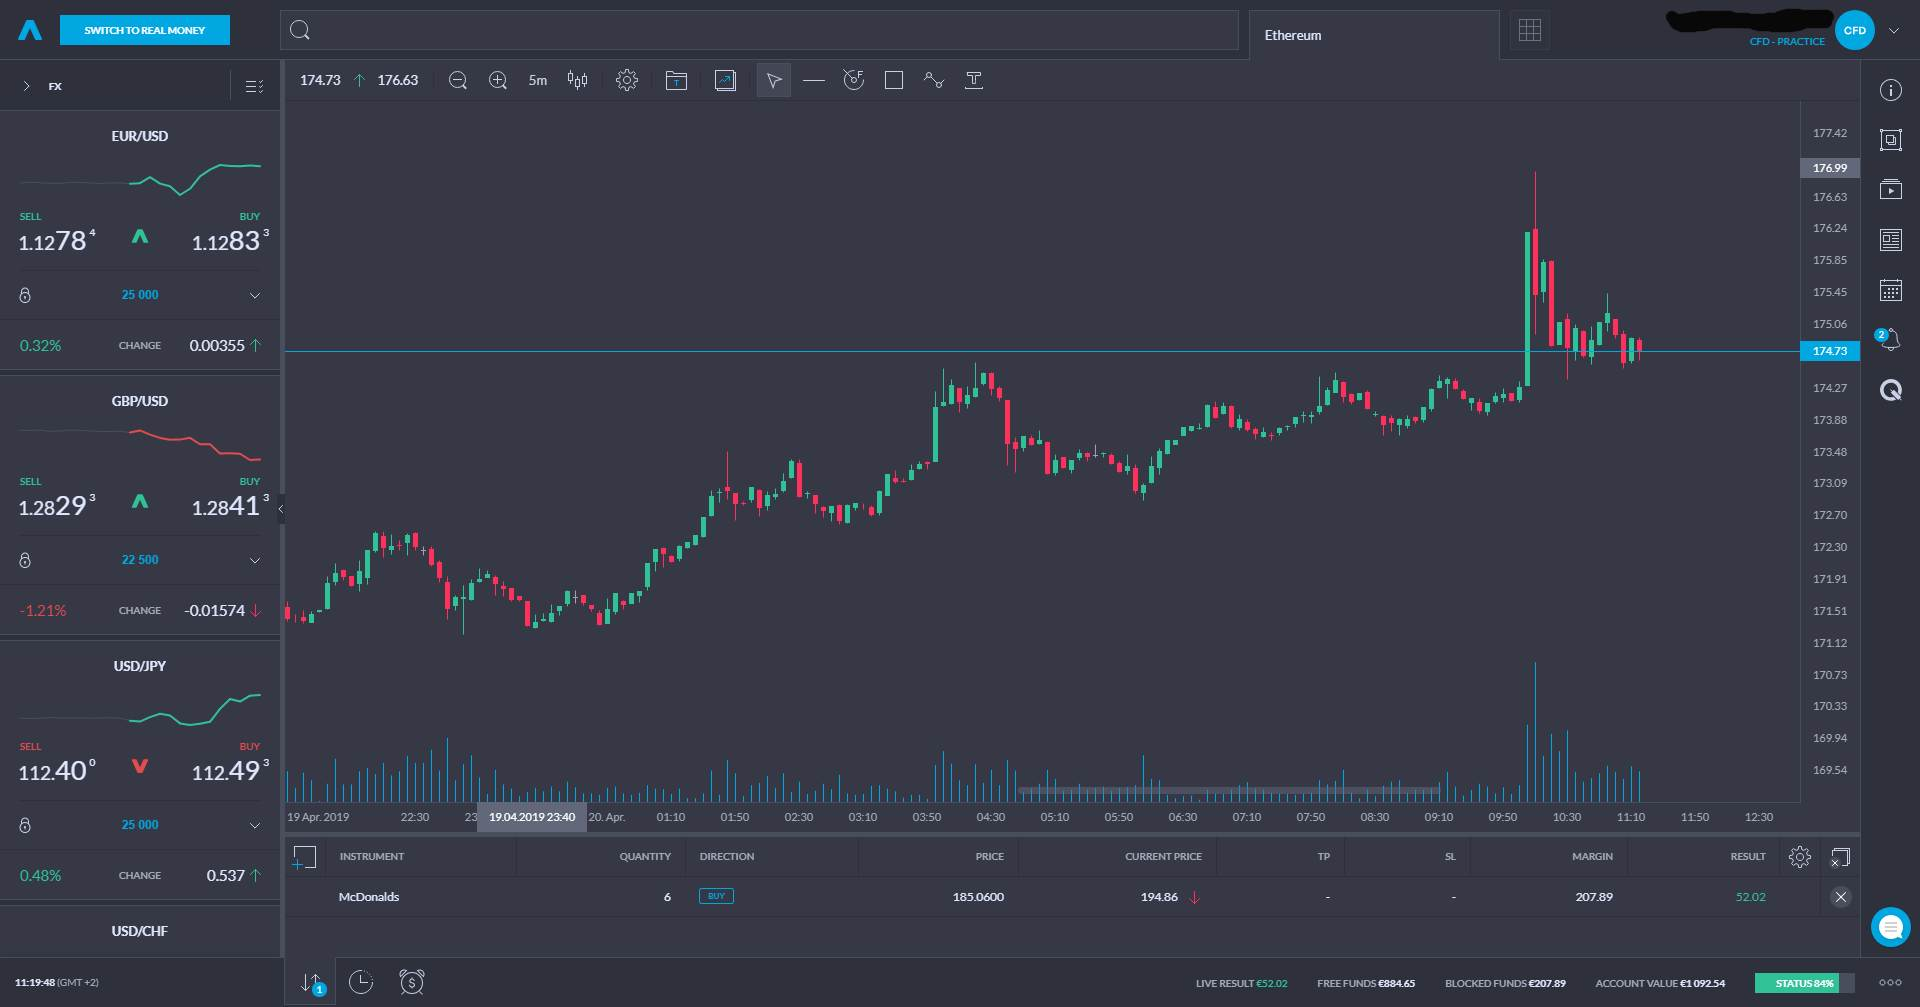 Trading 212 chart